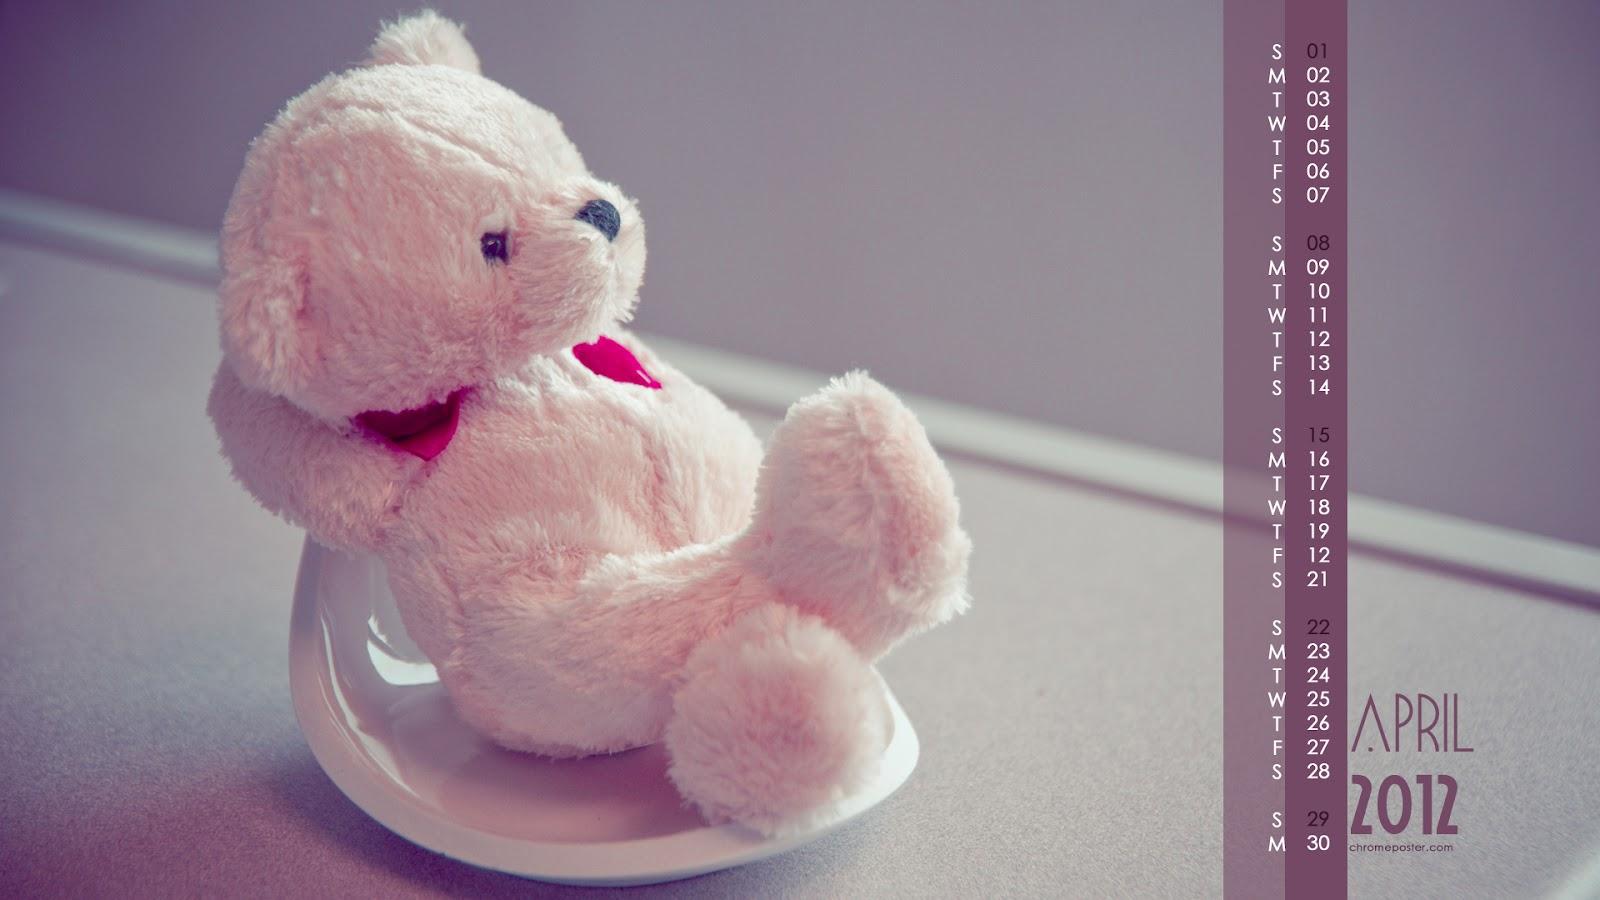 http://2.bp.blogspot.com/-jAUYGclbe4U/T3SLoxEz5EI/AAAAAAAAGiE/uQ7Ahf5a7KI/s1600/furry_teddy-1920-x-1080.jpg